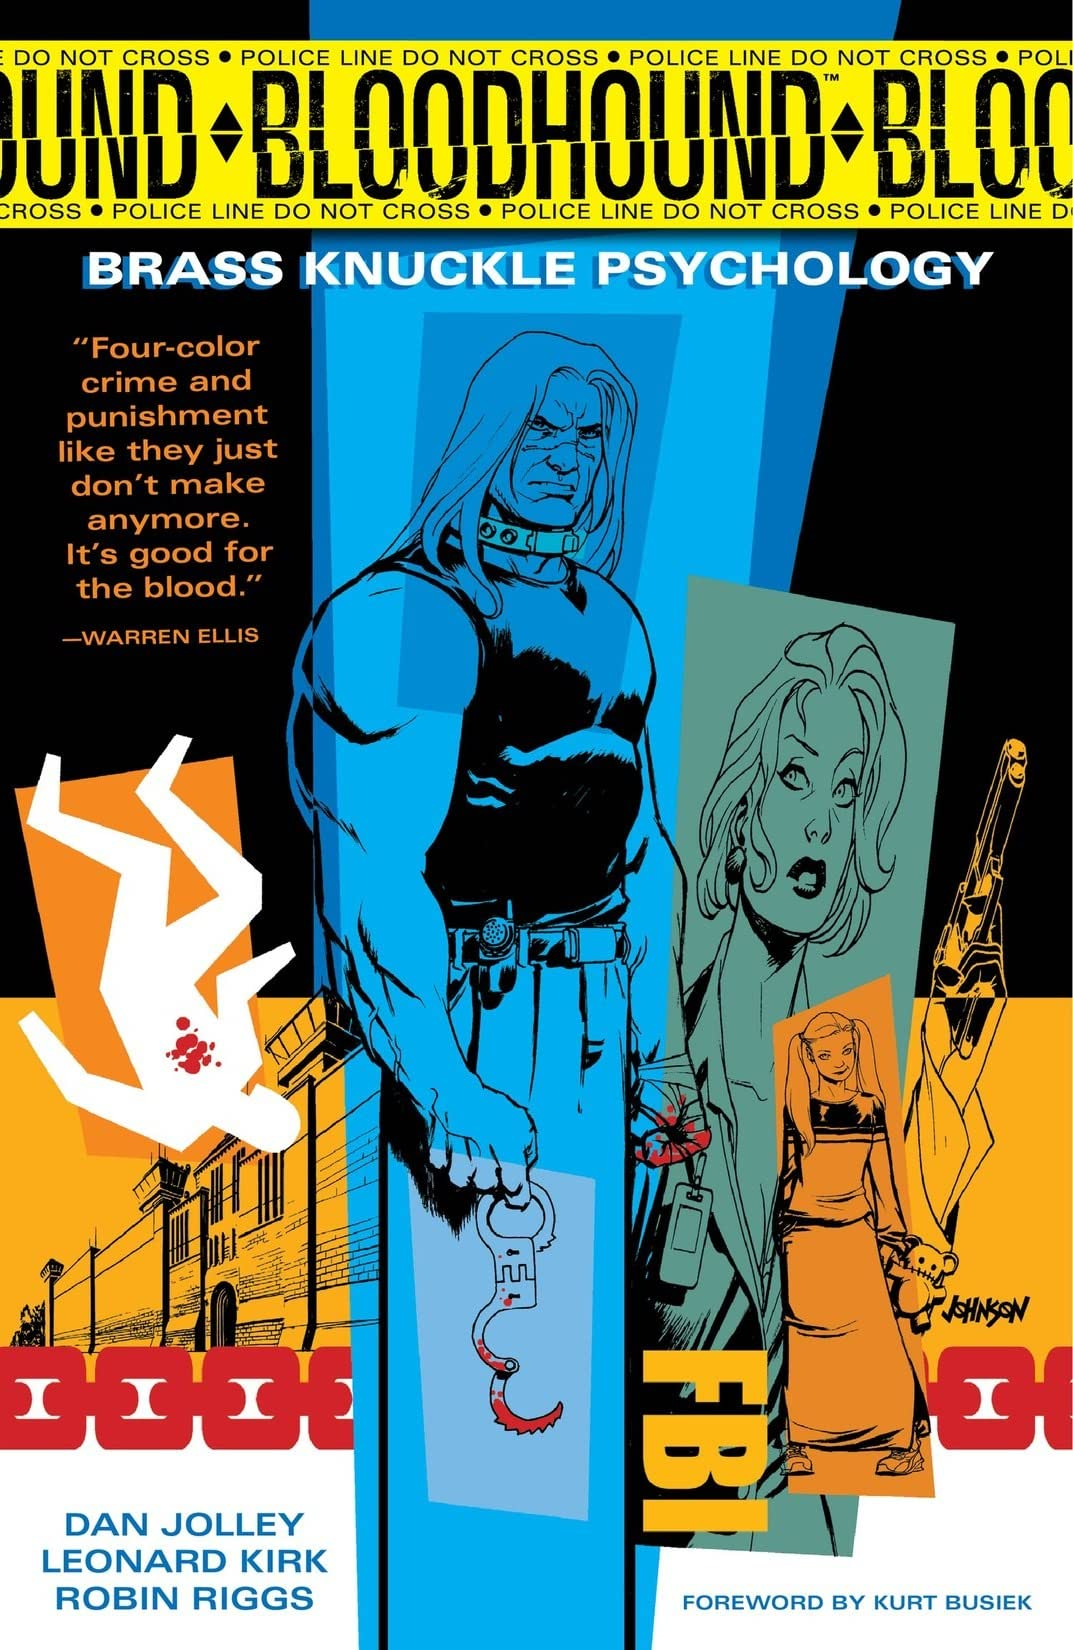 Bloodhound Vol. 1: Brass Knuckle Psychology